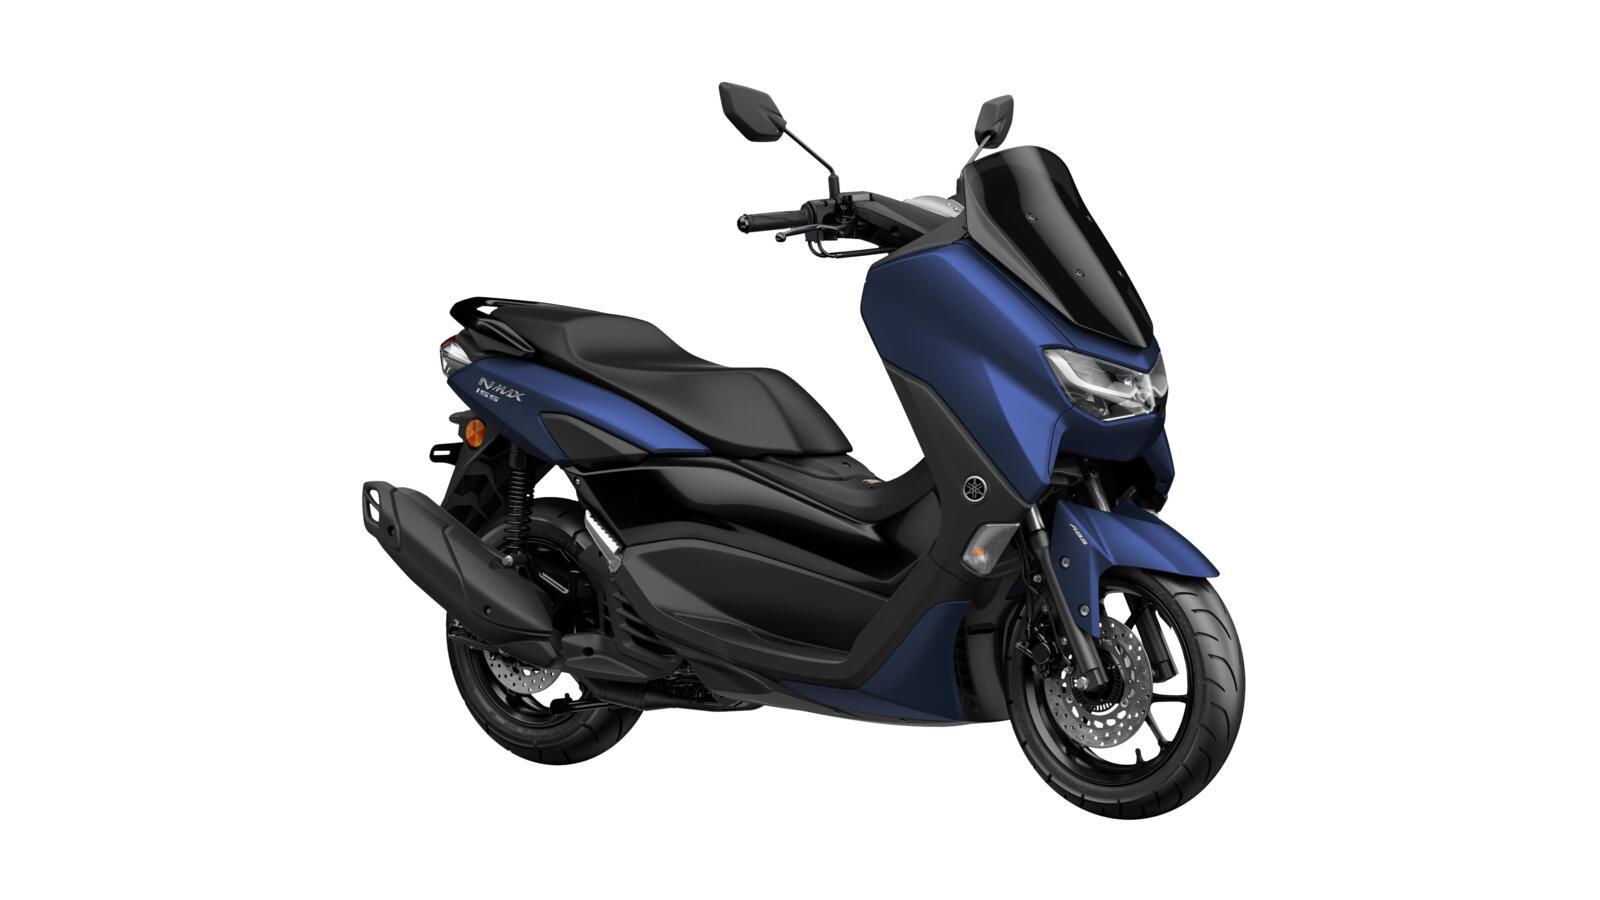 Yamaha NMAX 155 | MotorCentrumWest